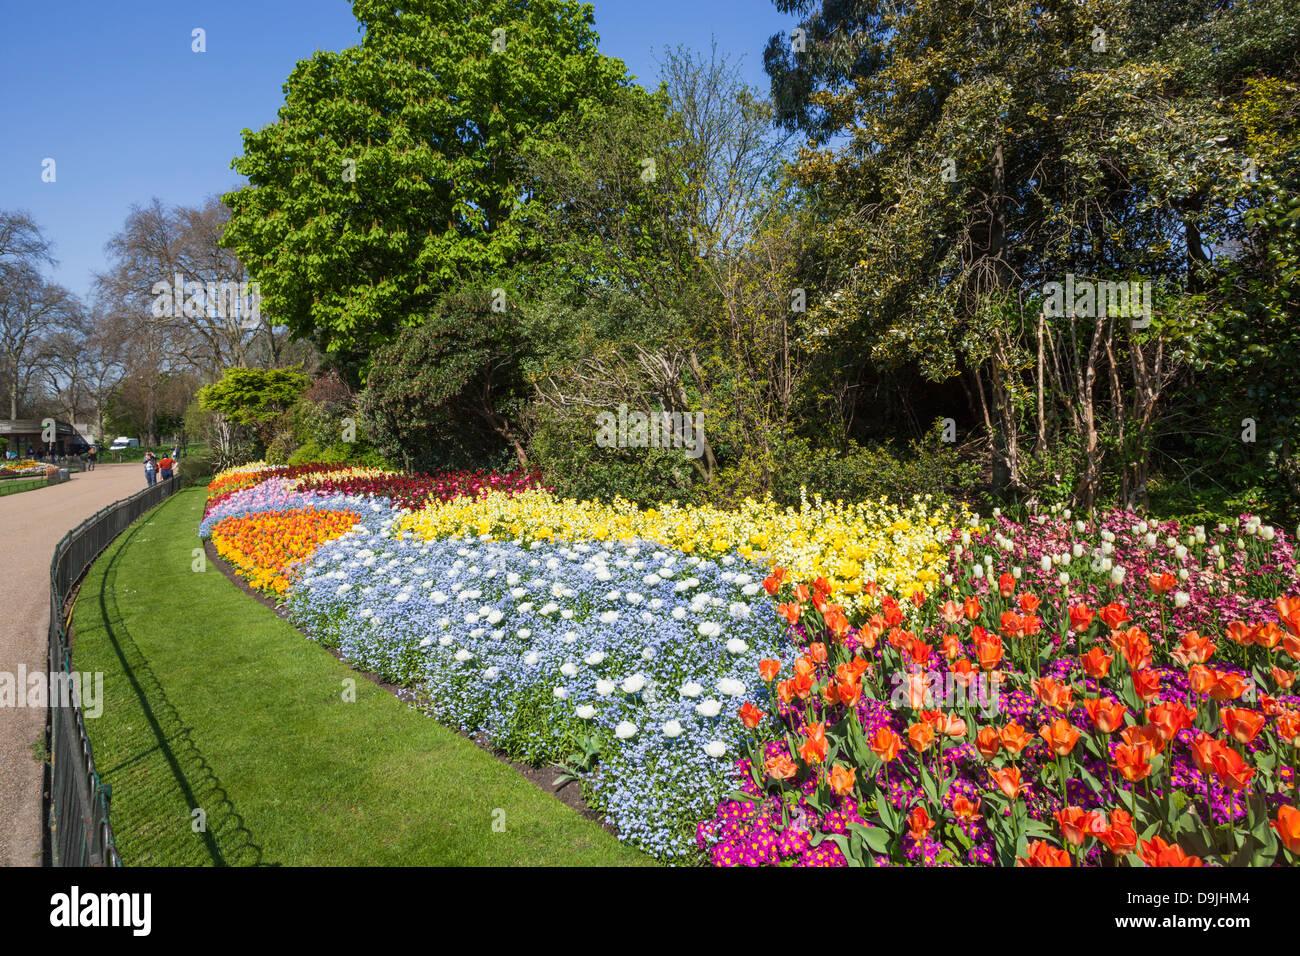 England london st james park spring flowers stock photo 57572036 england london st james park spring flowers mightylinksfo